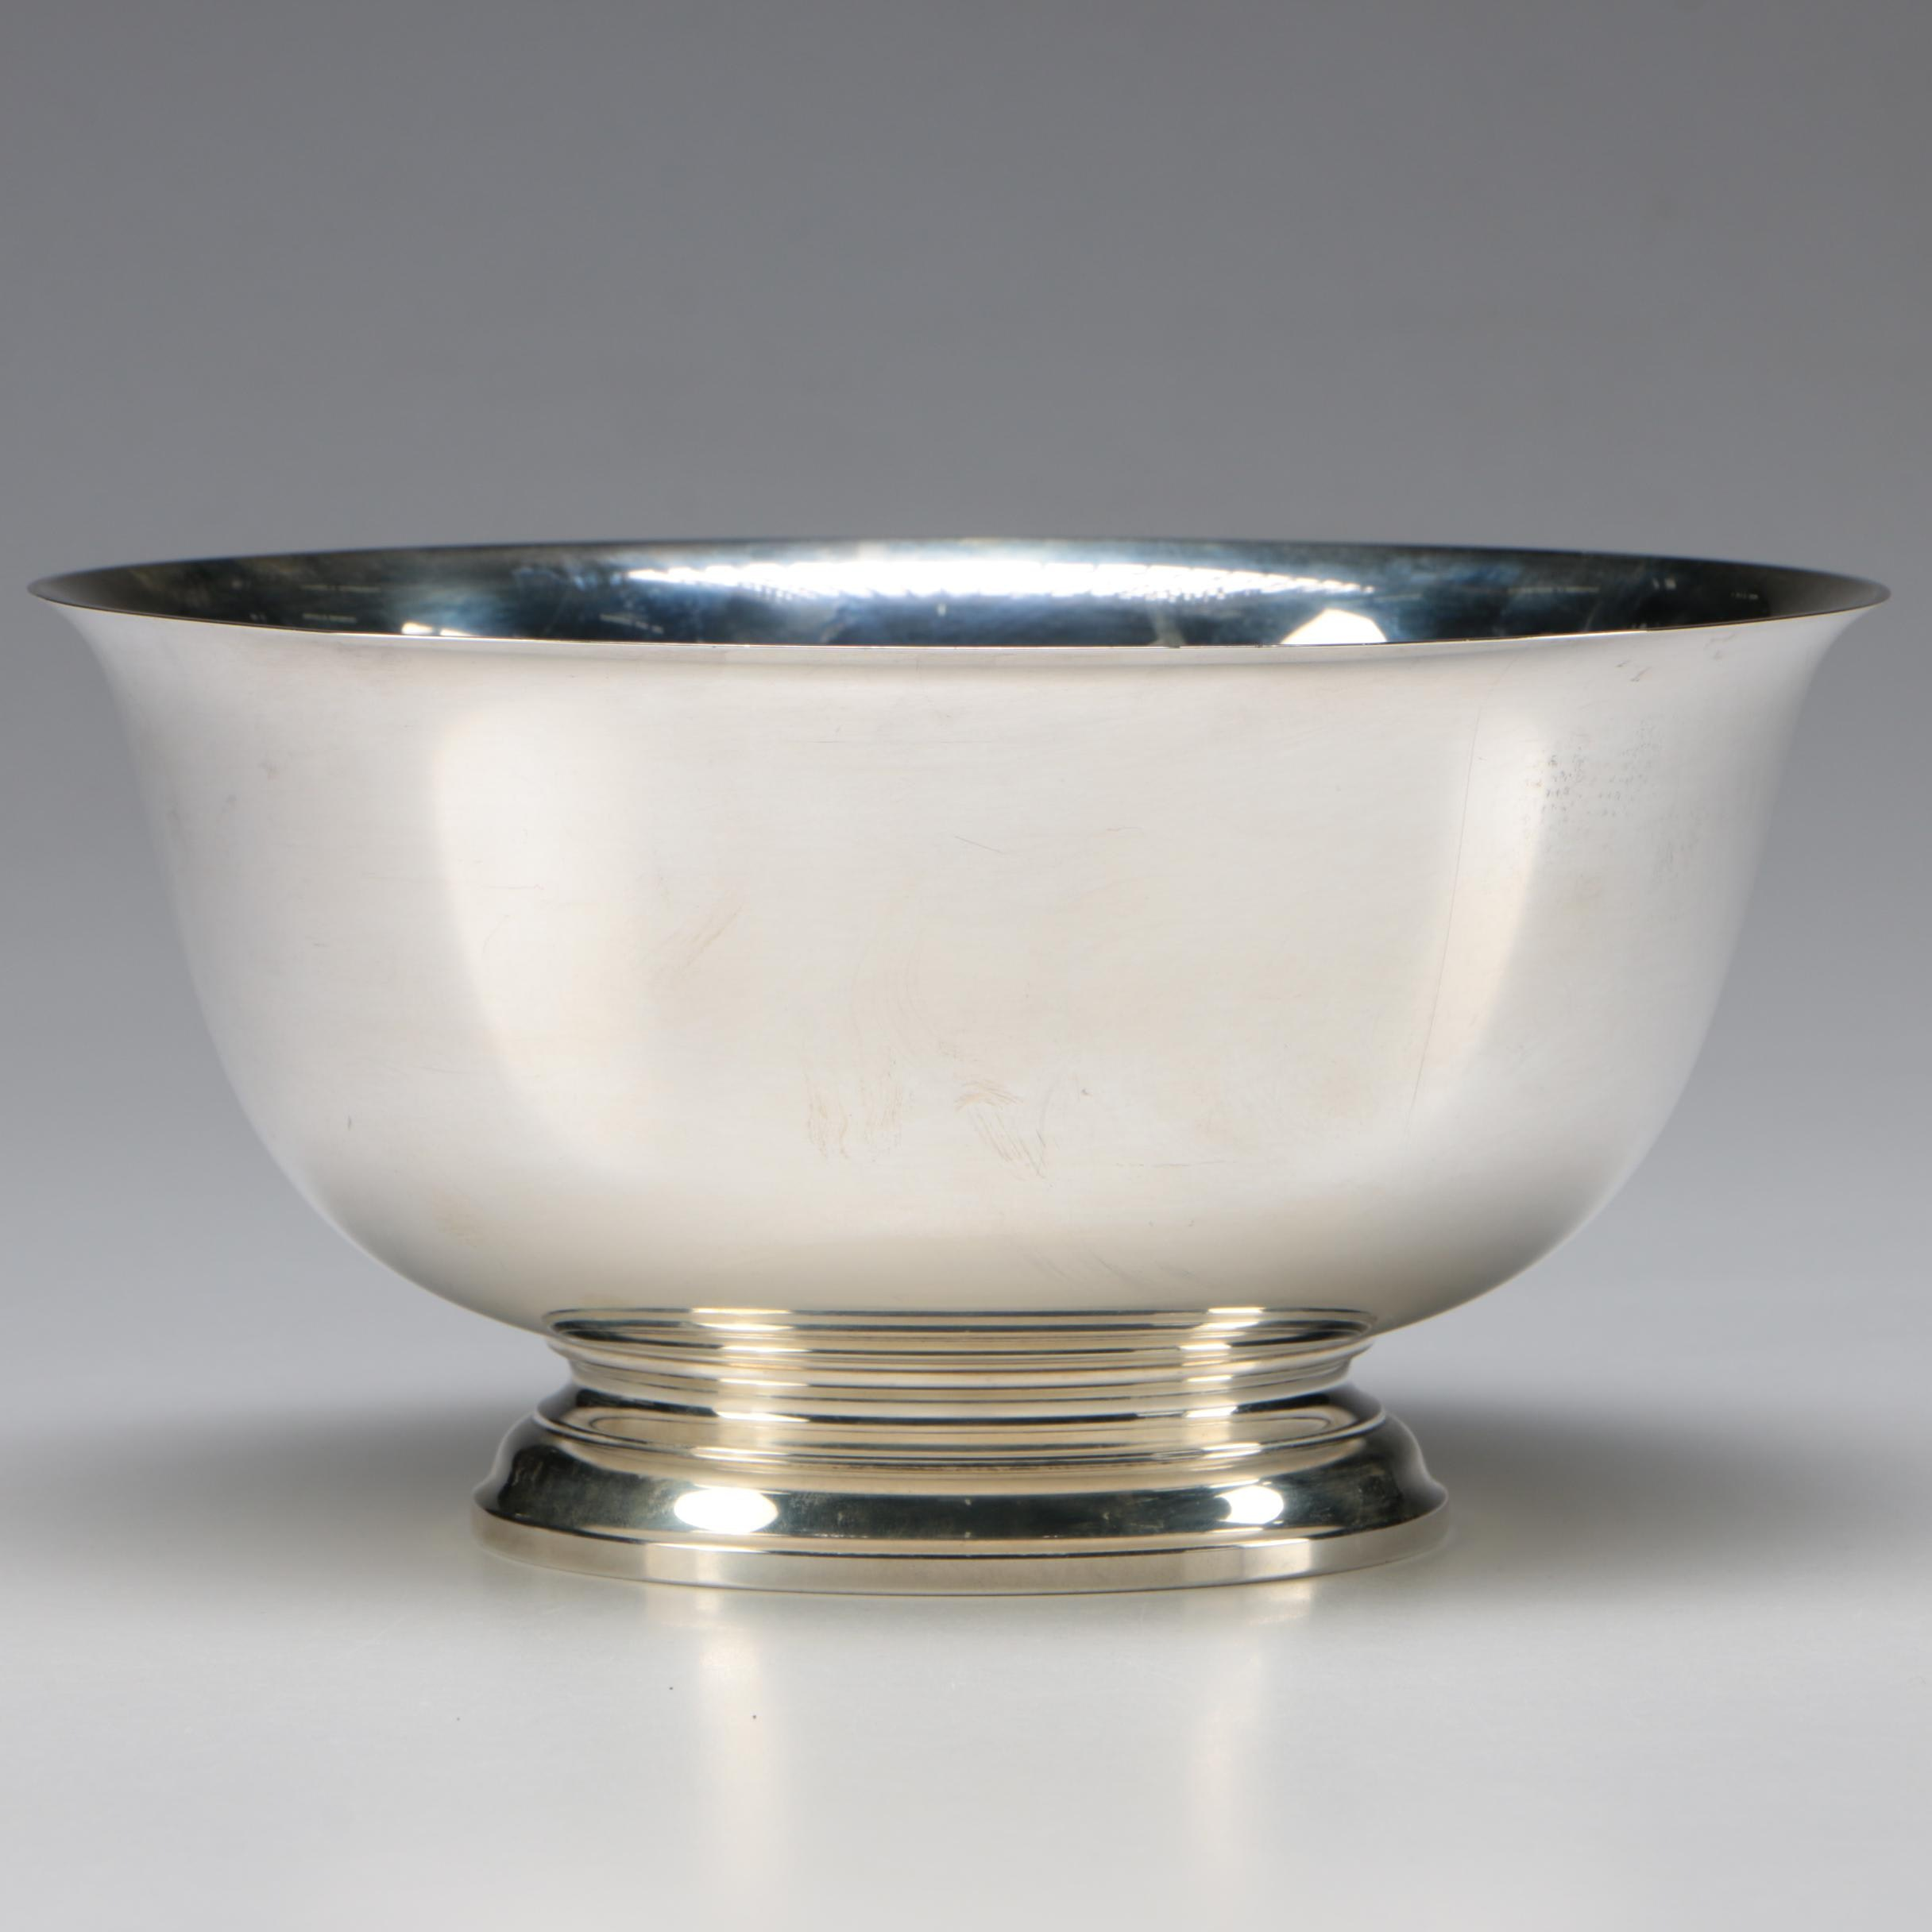 Gorham Sterling Silver Reproduction Paul Revere Bowl, 1956